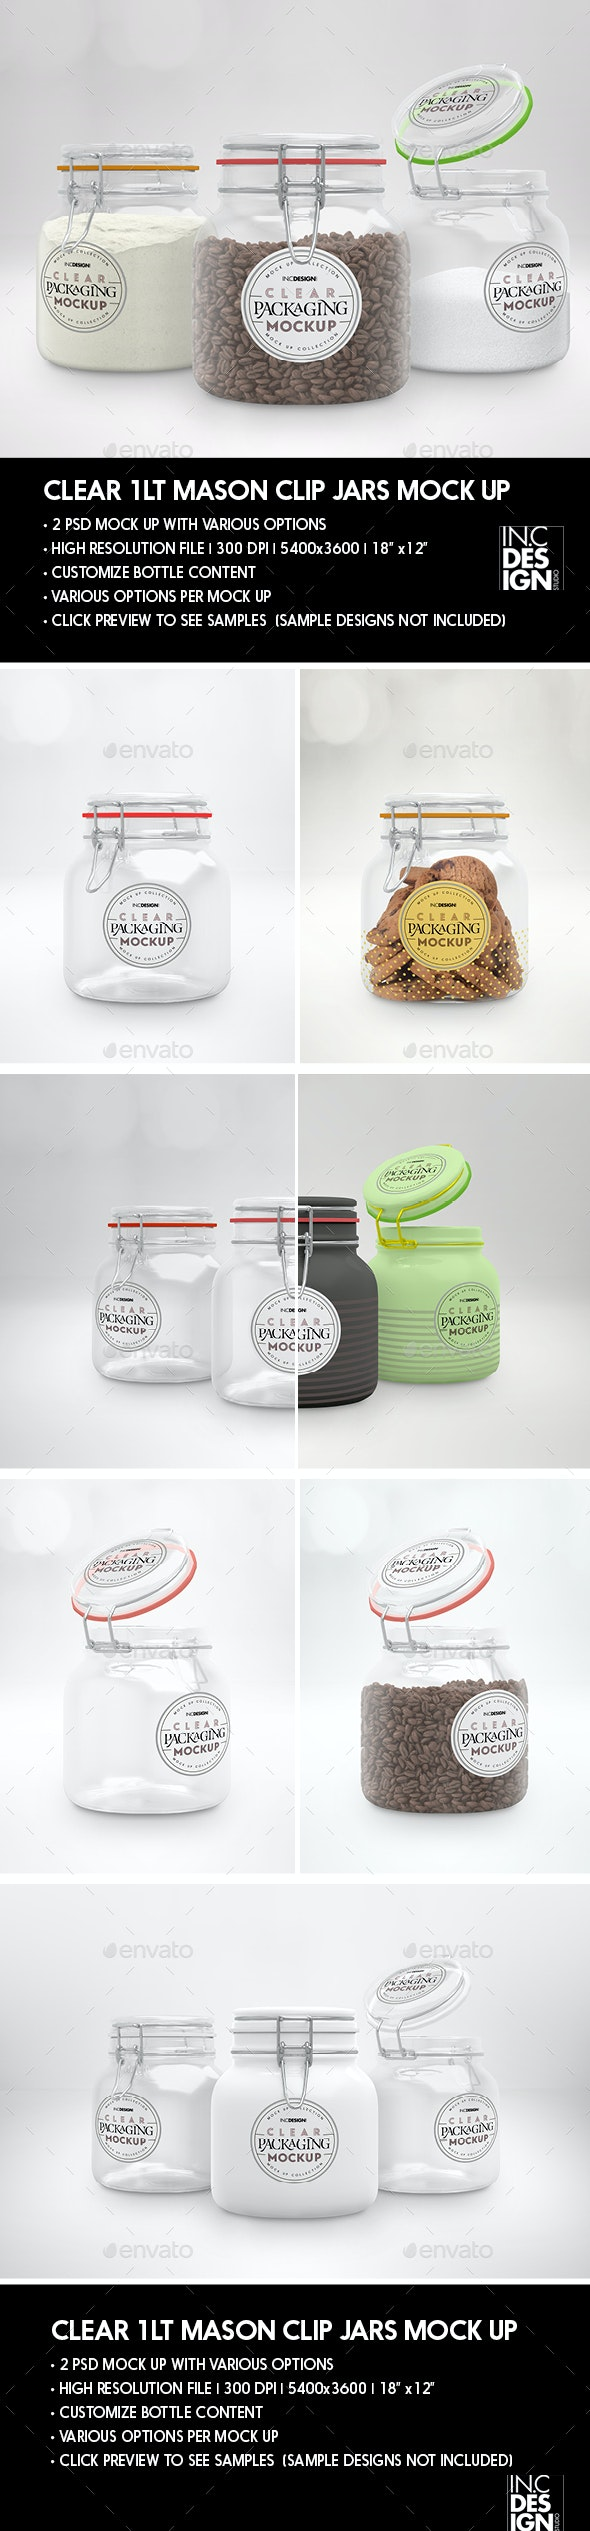 Clear 1Liter Mason Clip Jar Packaging Mockup - Packaging Product Mock-Ups